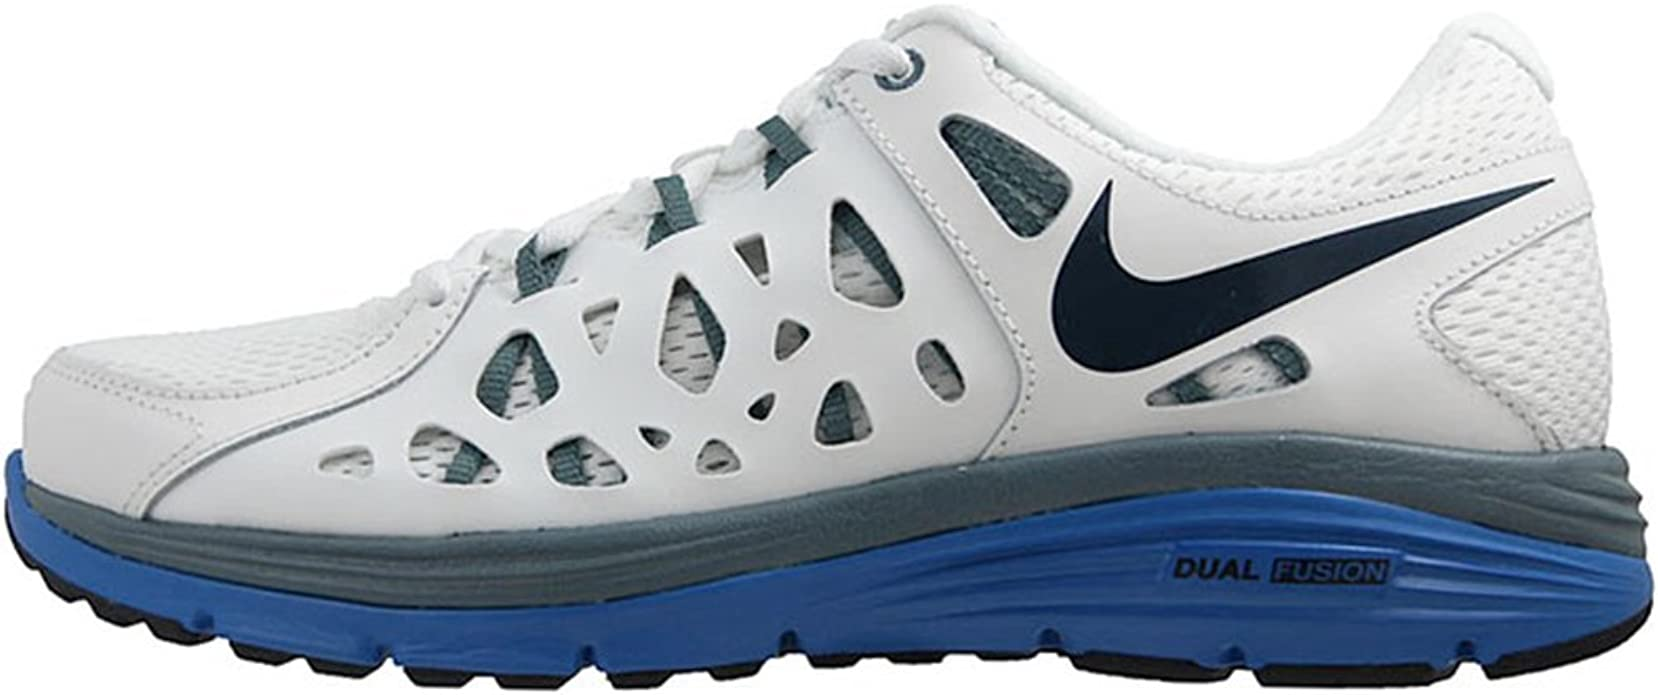 Nike Dual Fusion Run 2, Zapatillas de Running para Hombre, Blanco/Azul (SMMT Wht/Armry Nvy-Armry Slt-P-), 47 EU: Amazon.es: Zapatos y complementos